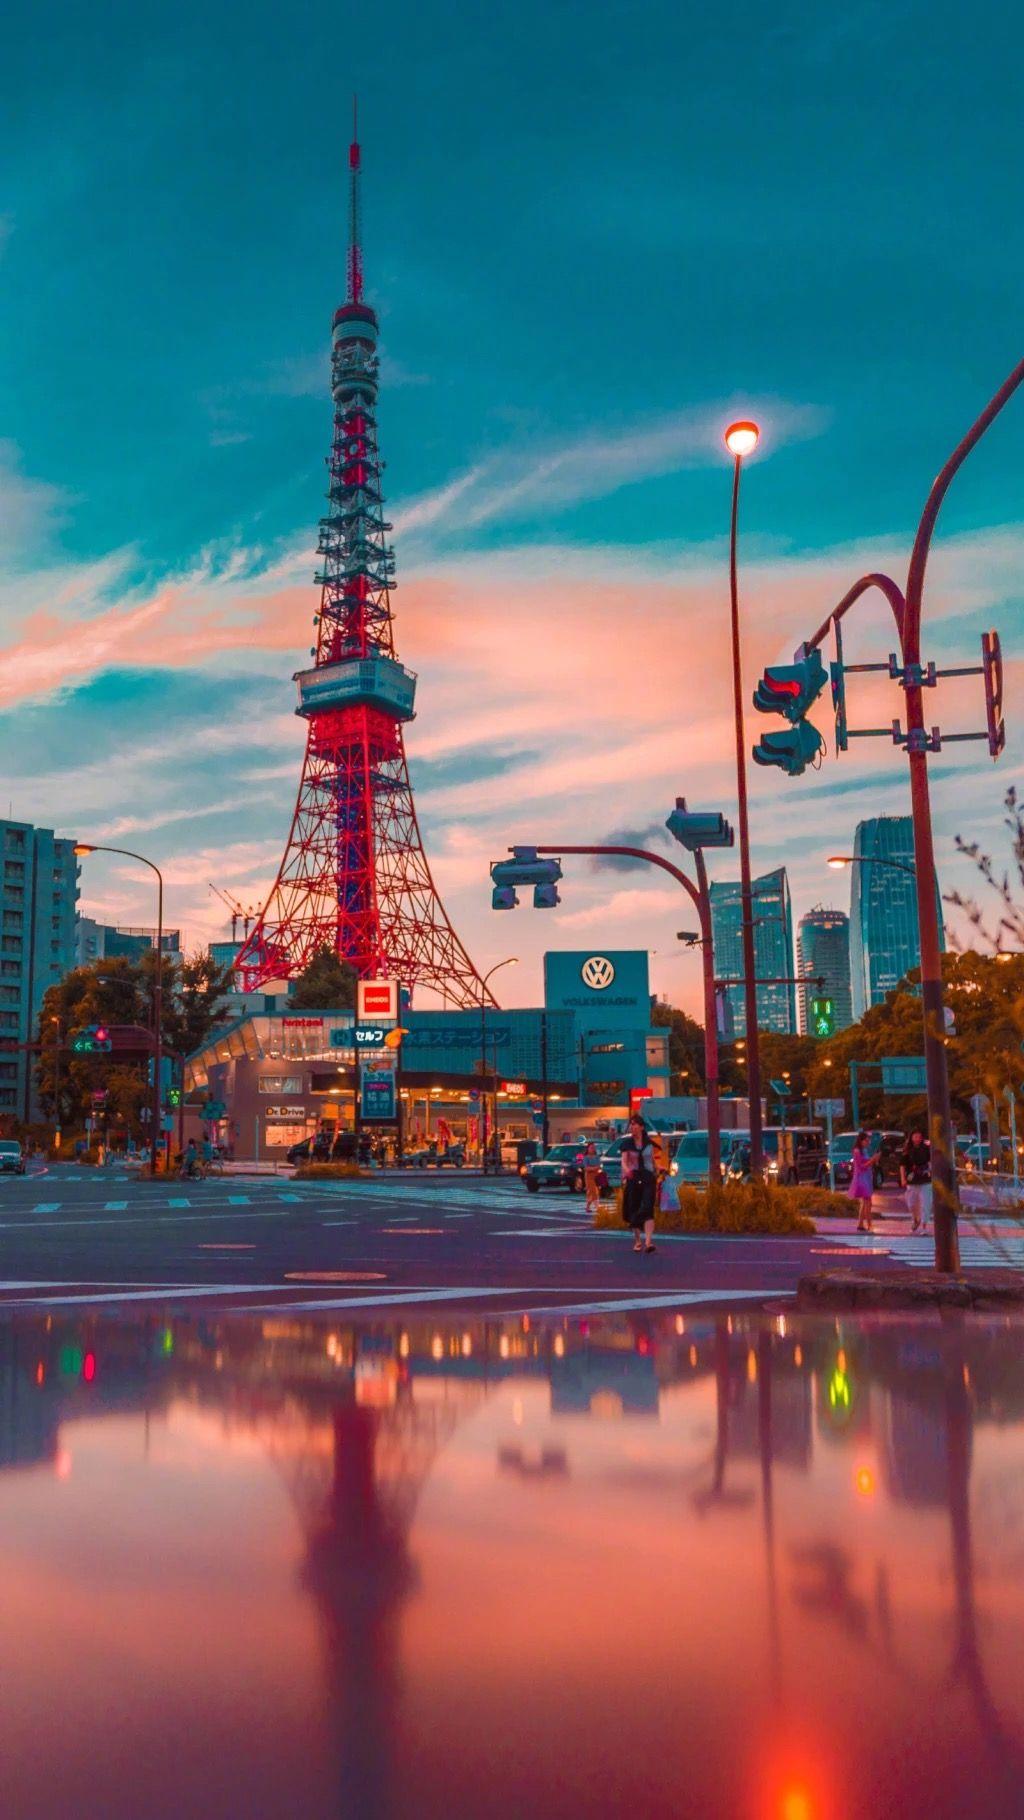 View Reality おしゃれまとめの人気アイデア Pinterest Gabriel 16 東京 風景 都市景観 美しい風景写真